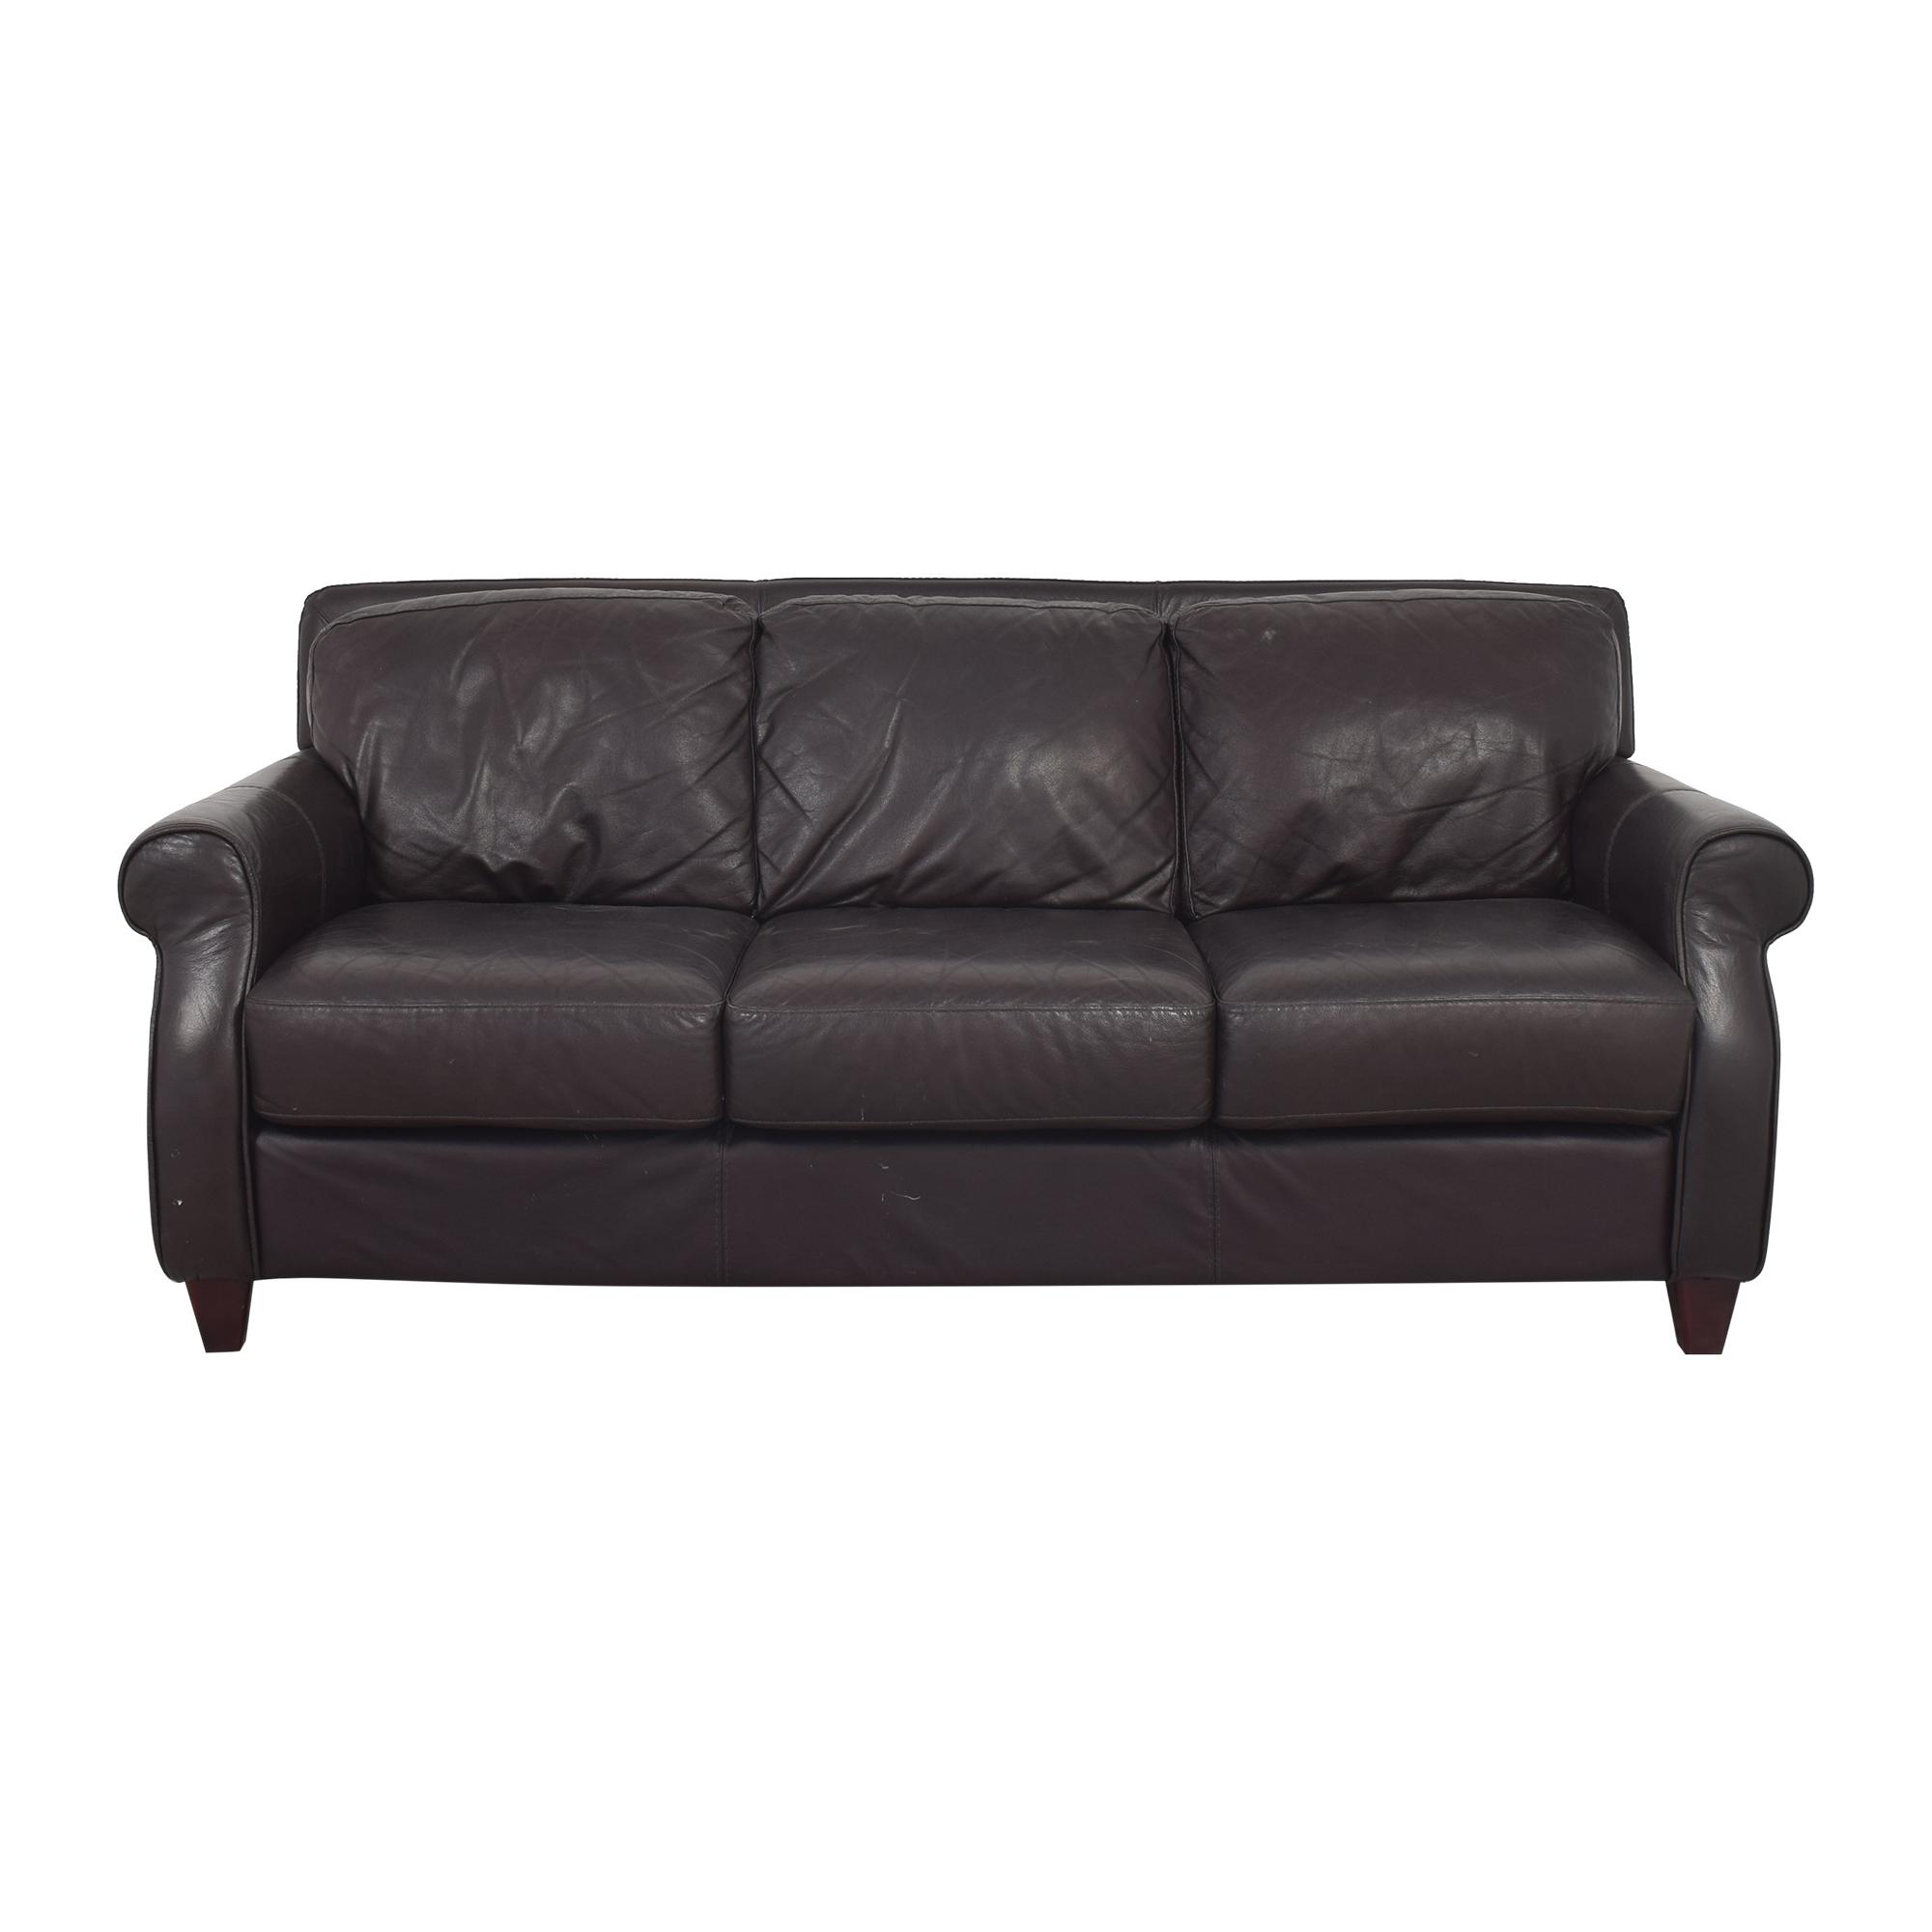 Raymour & Flanigan Raymour & Flanigan Roll Arm Sofa ma